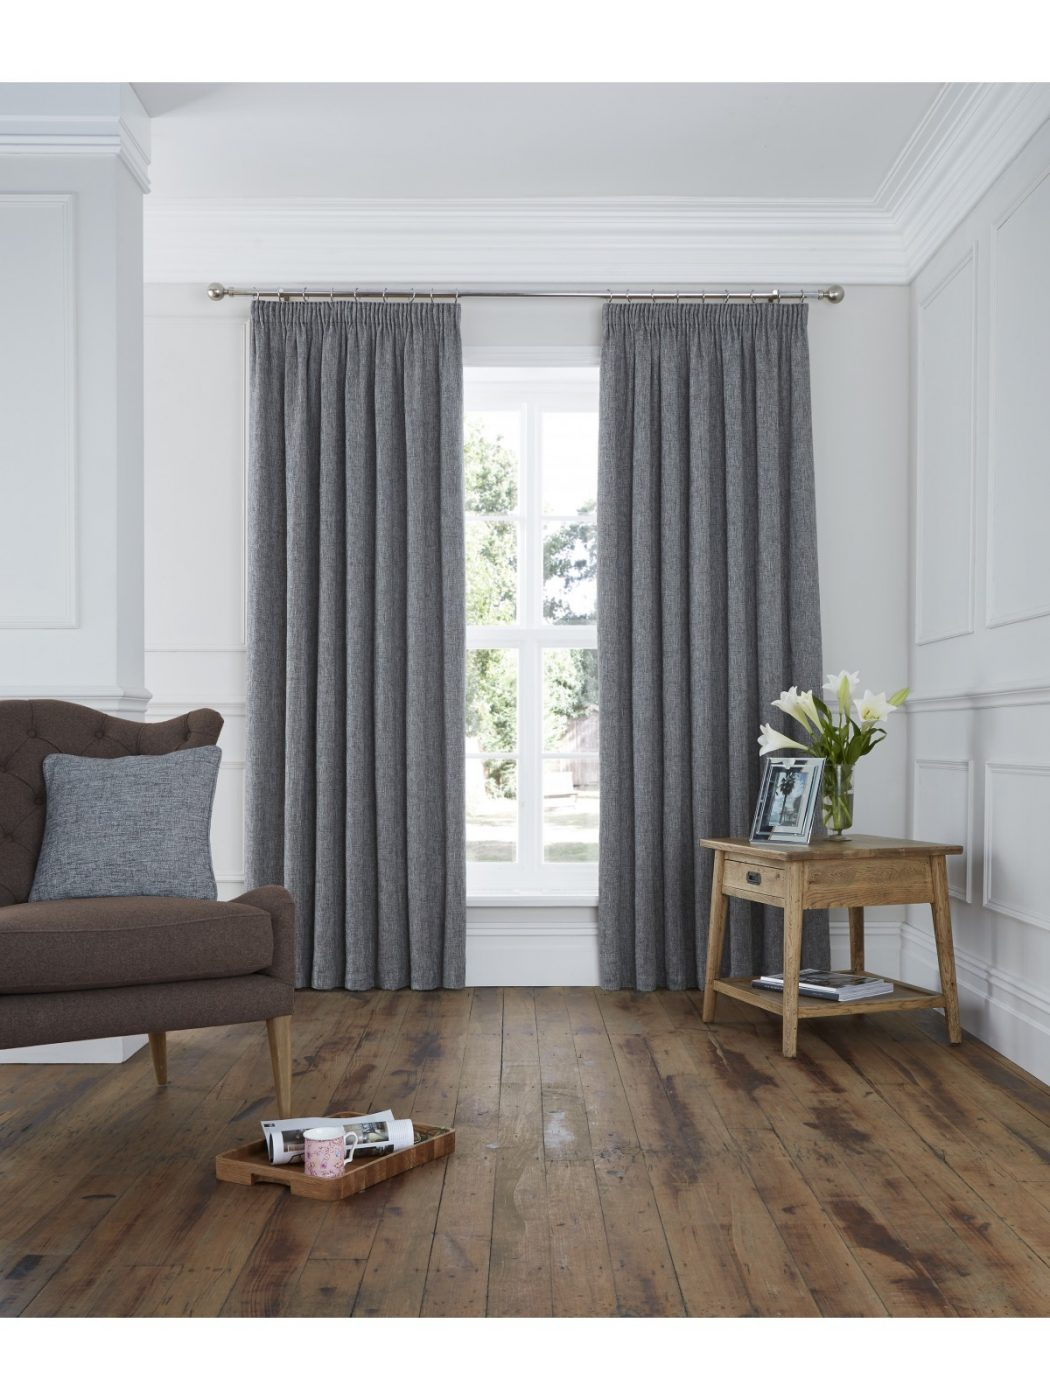 lucerne_plain_pencil_pleat_curtain_grey_1 20+ Hottest Curtain Design Ideas for 2021